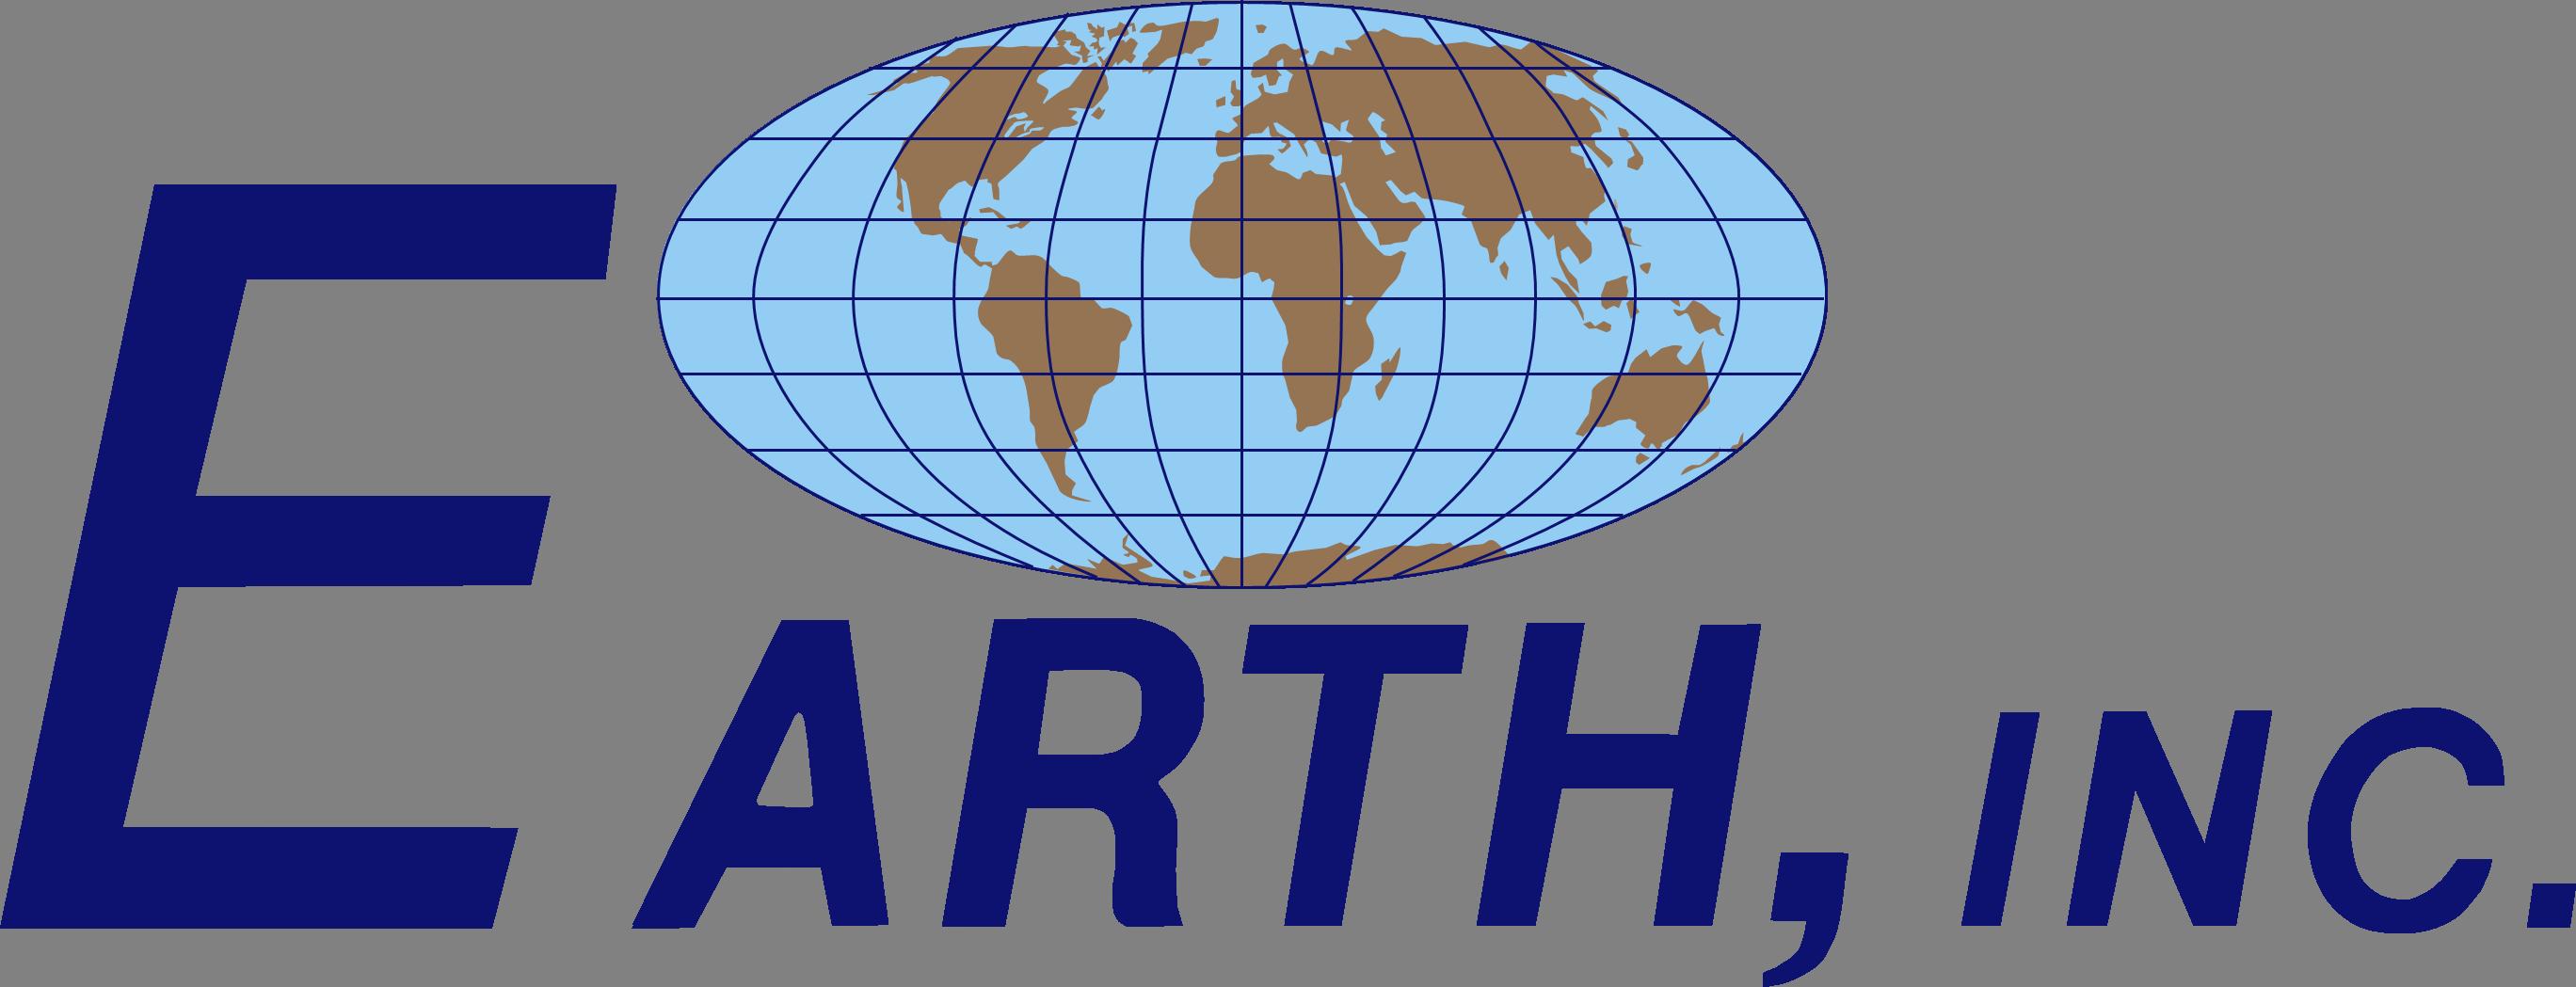 EarthInc-Logo